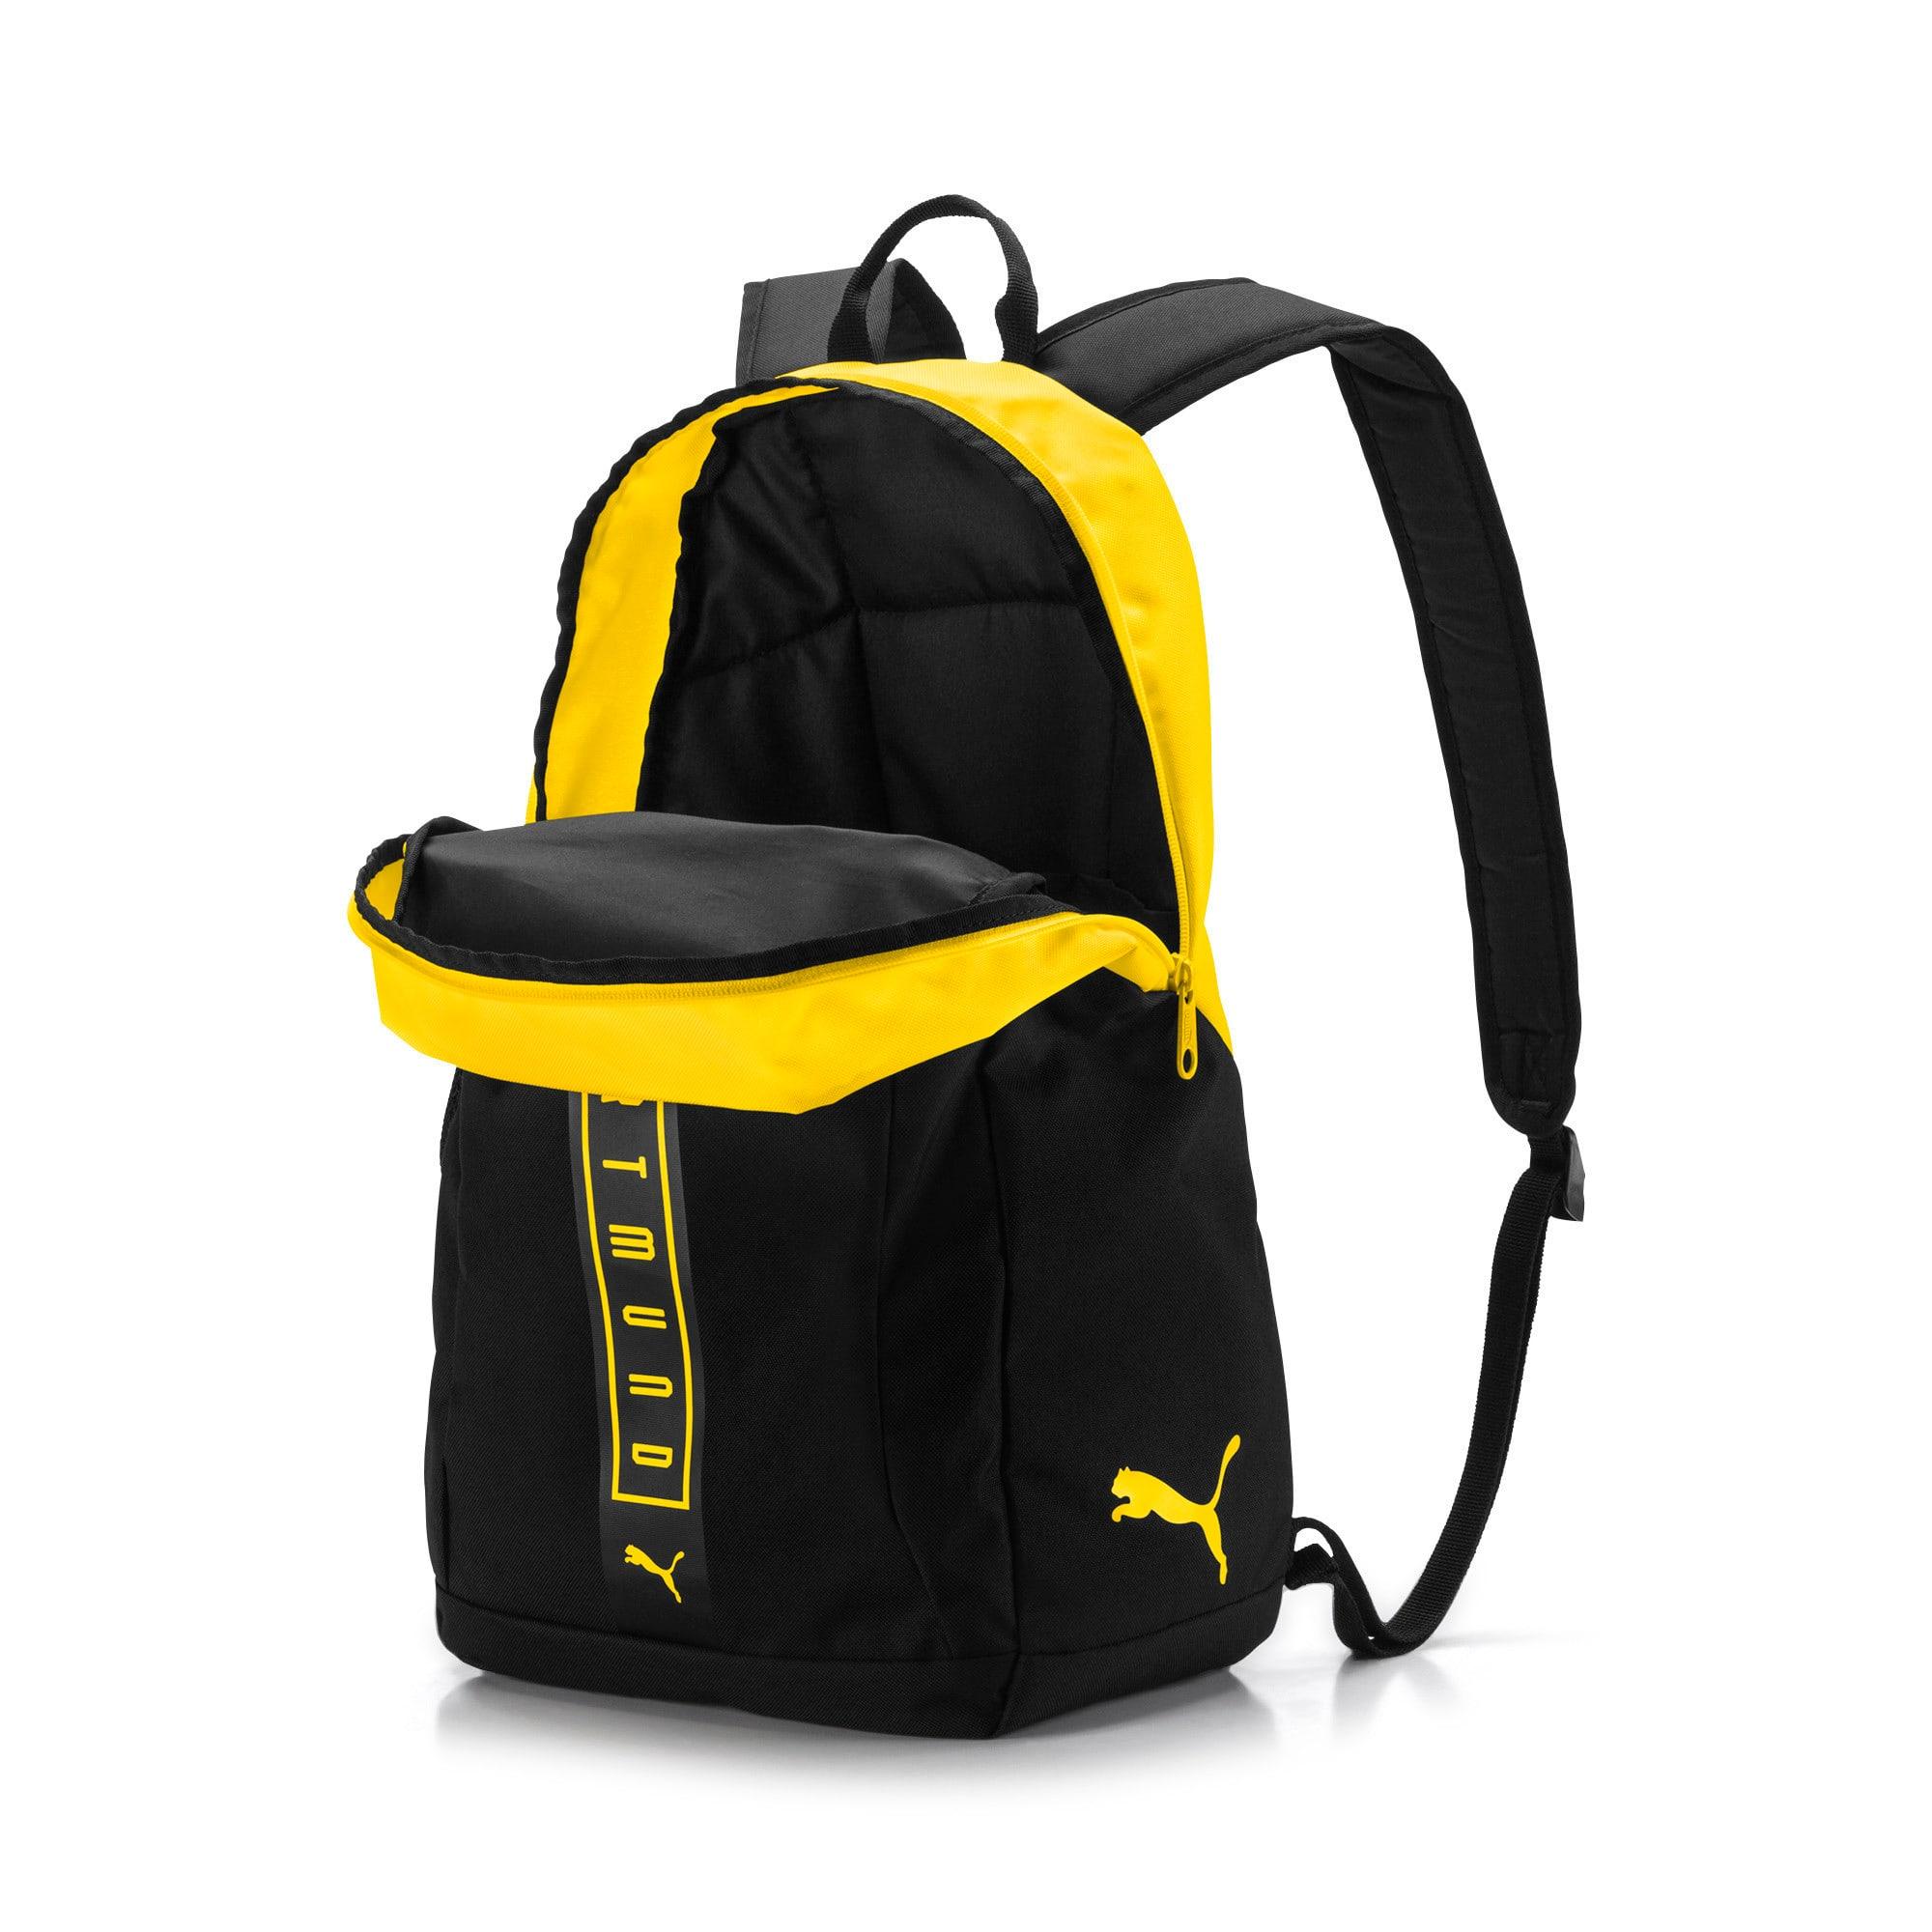 Thumbnail 3 of BVB Fan Backpack, Puma Black-Cyber Yellow, medium